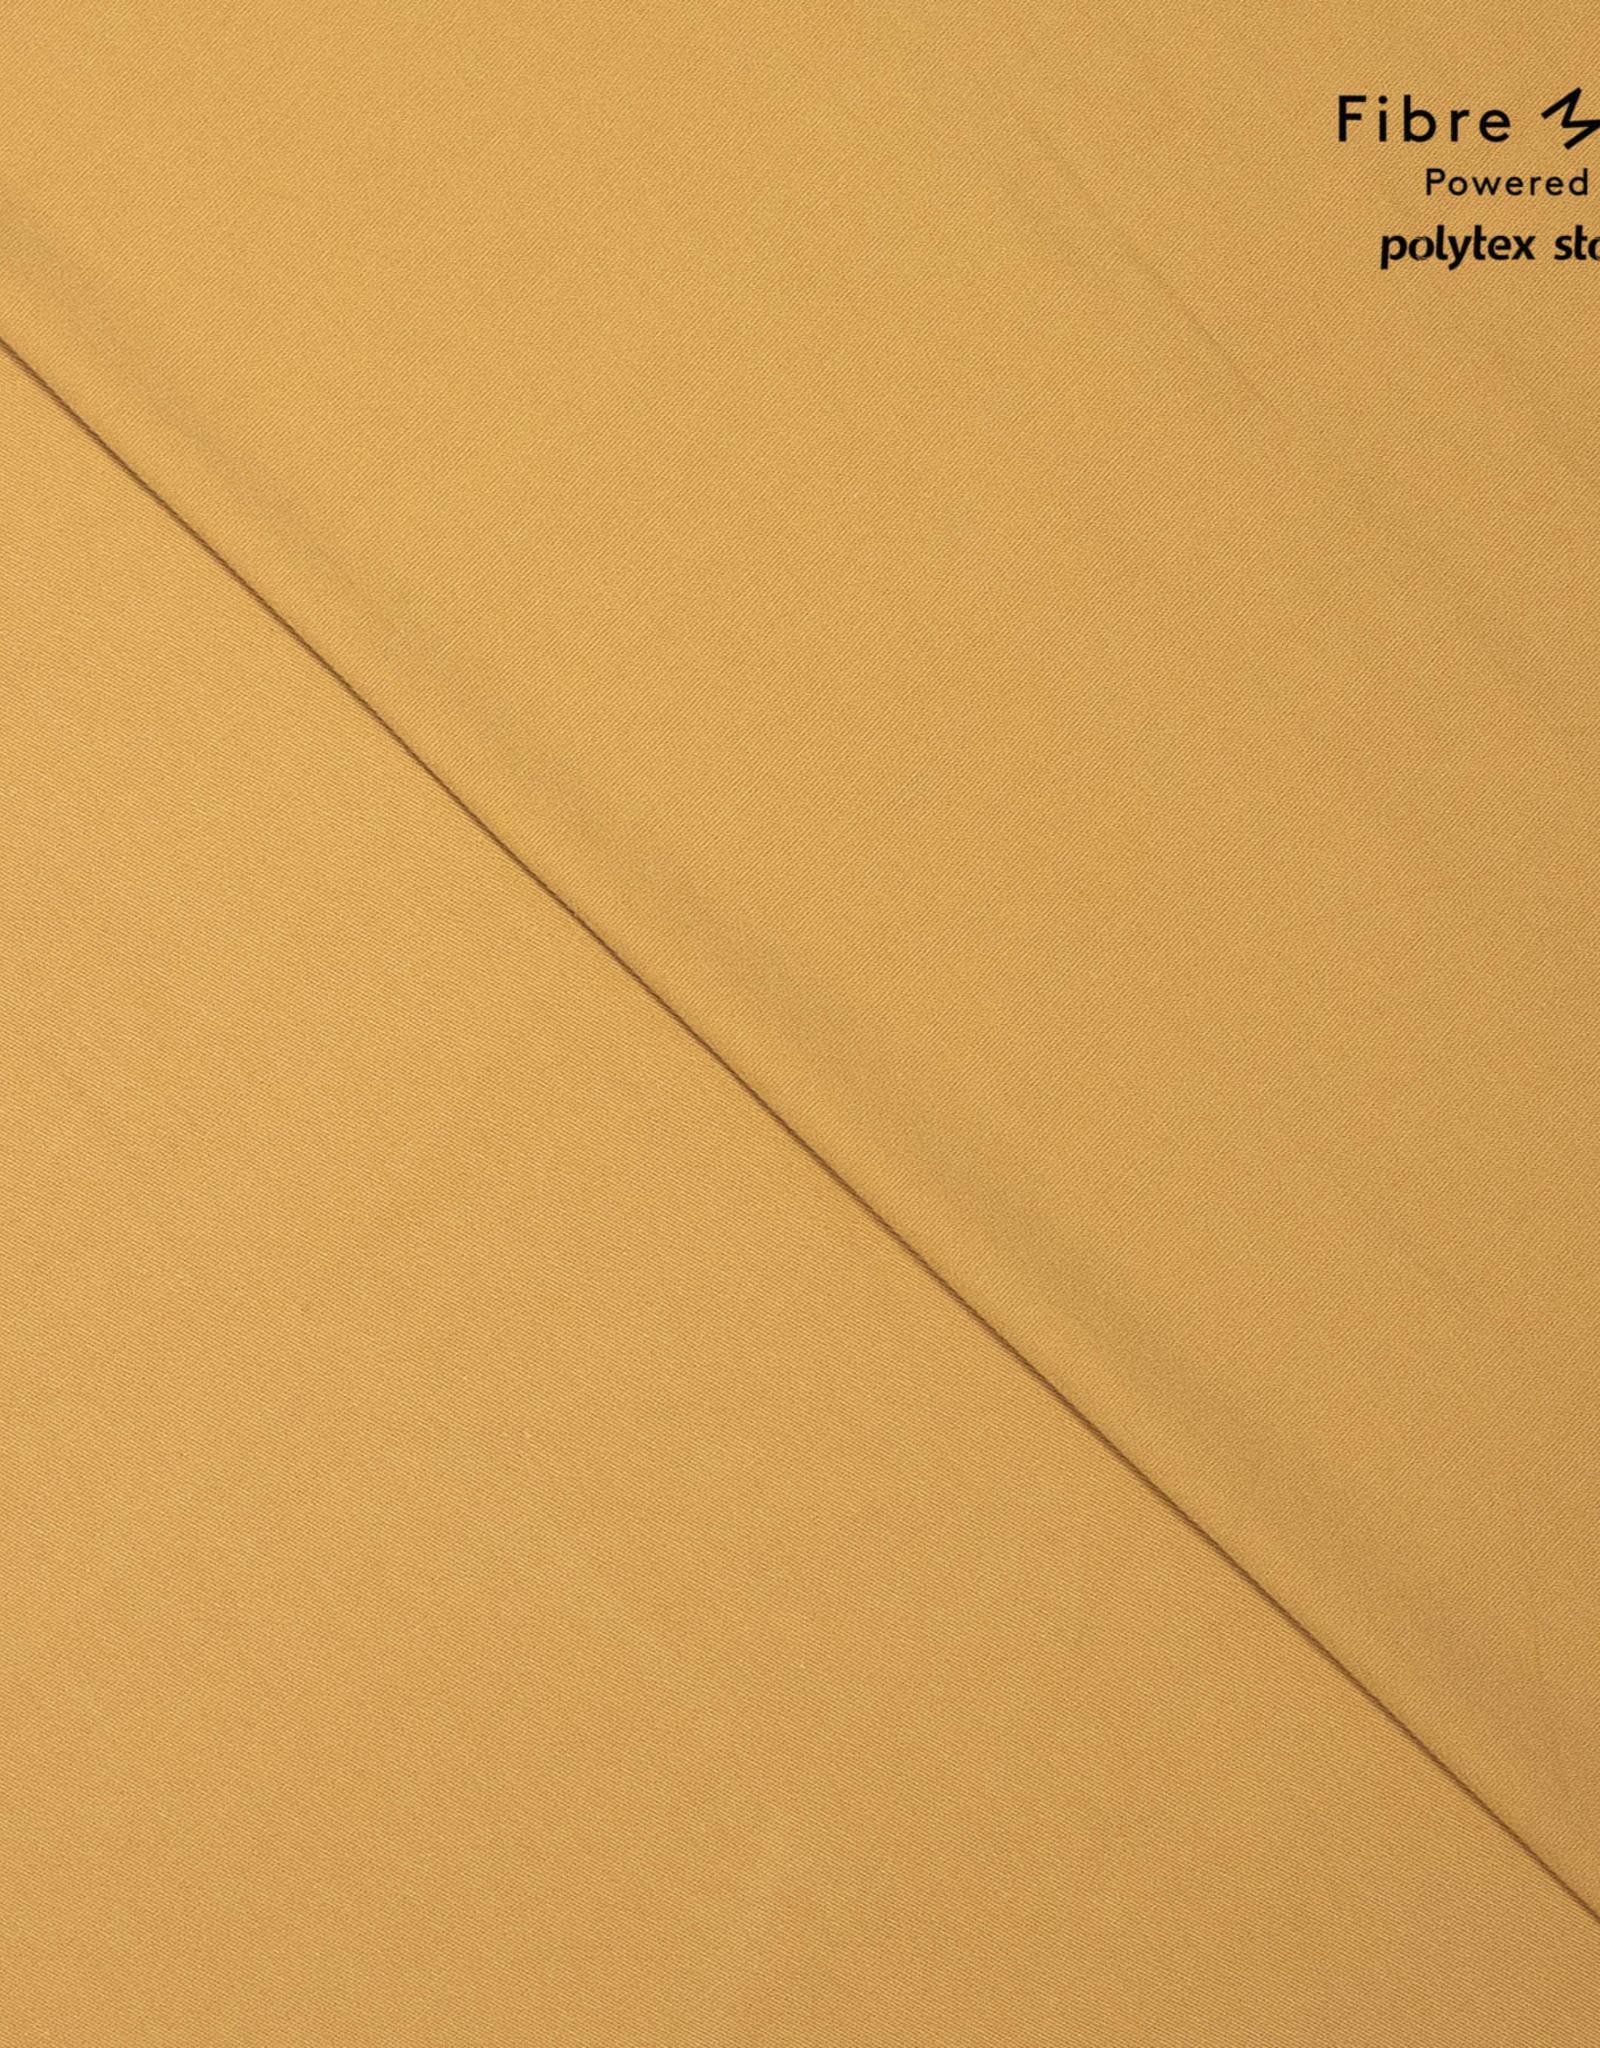 Fibre Mood Fibre Mood editie 14 Woven Denim elastisch Lime Yellow noelle + maya